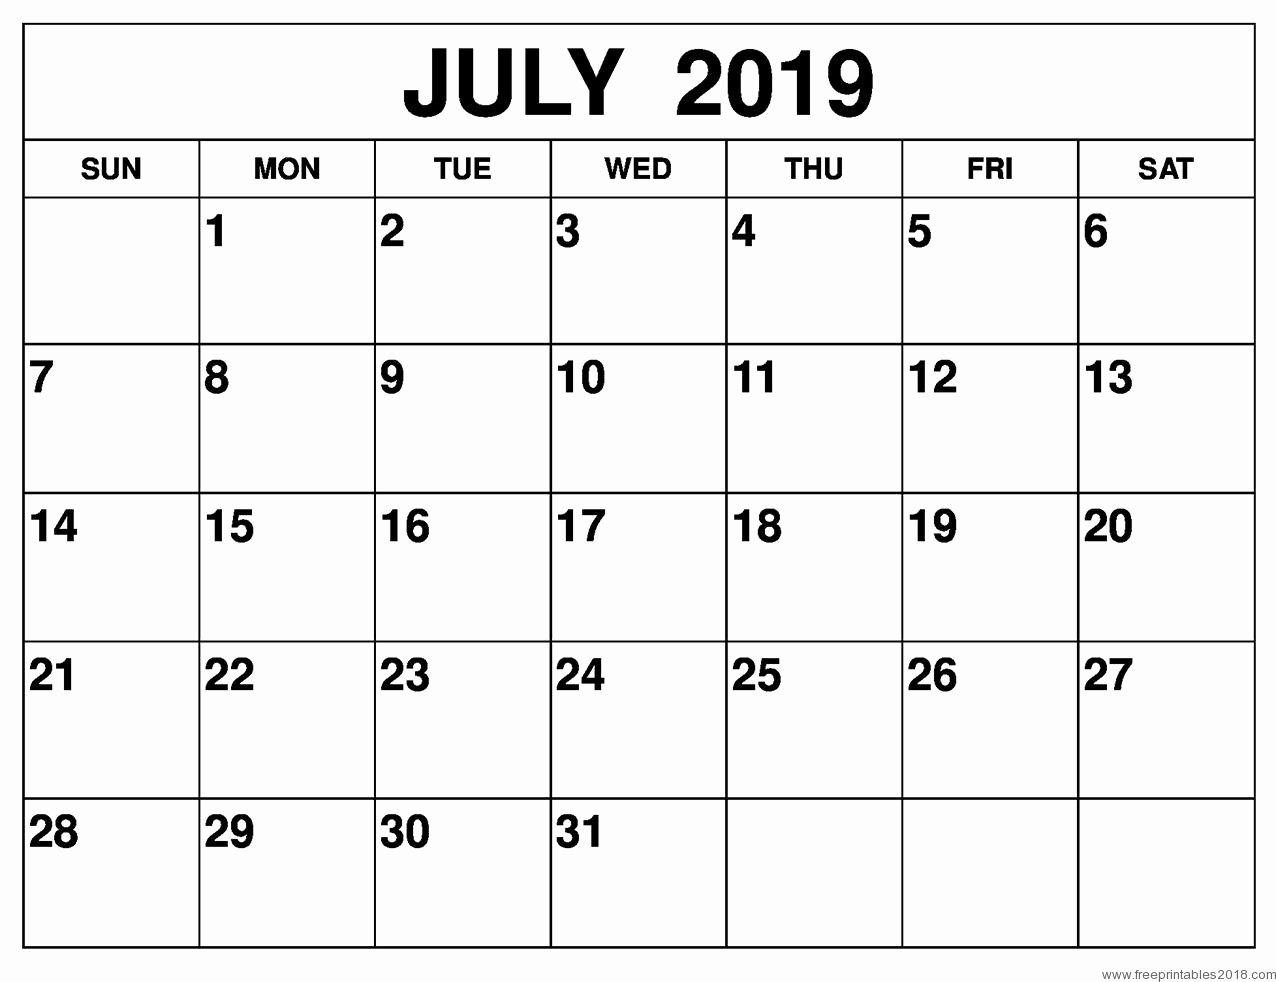 Free 2019 Calendar Template Elegant Calendar July 2019 Free Printable Templates